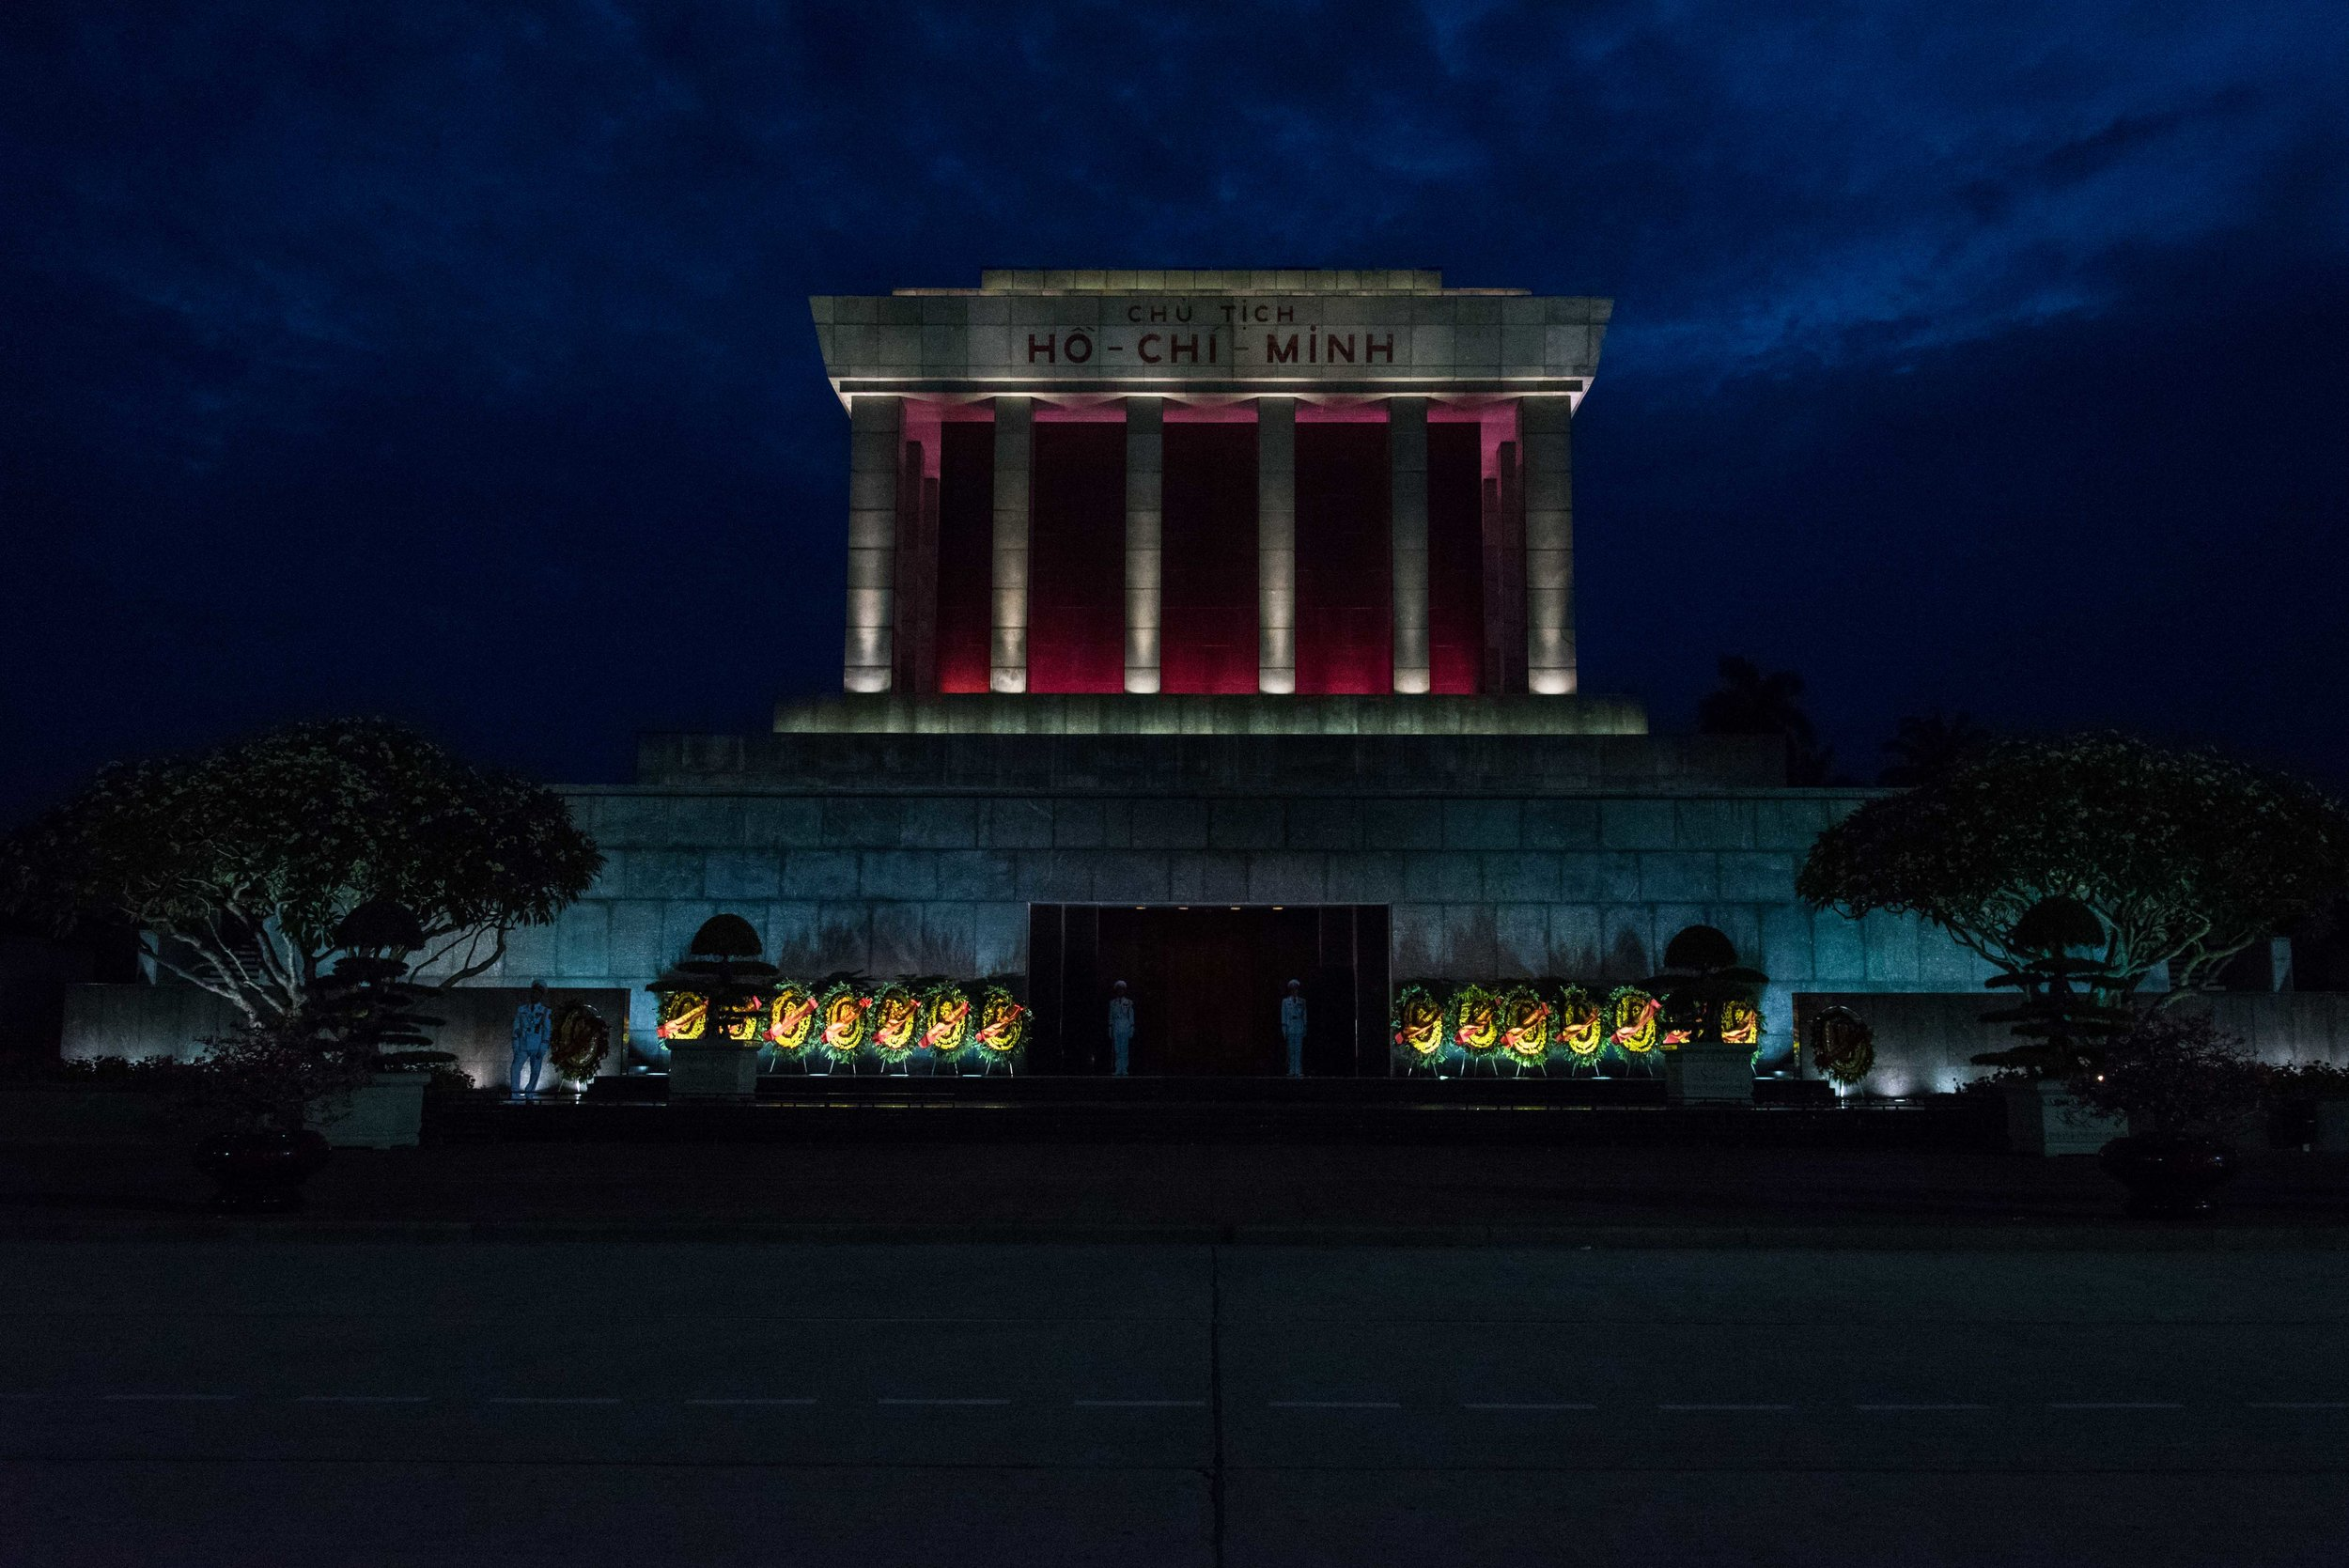 Ho Chi Minh's tomb.